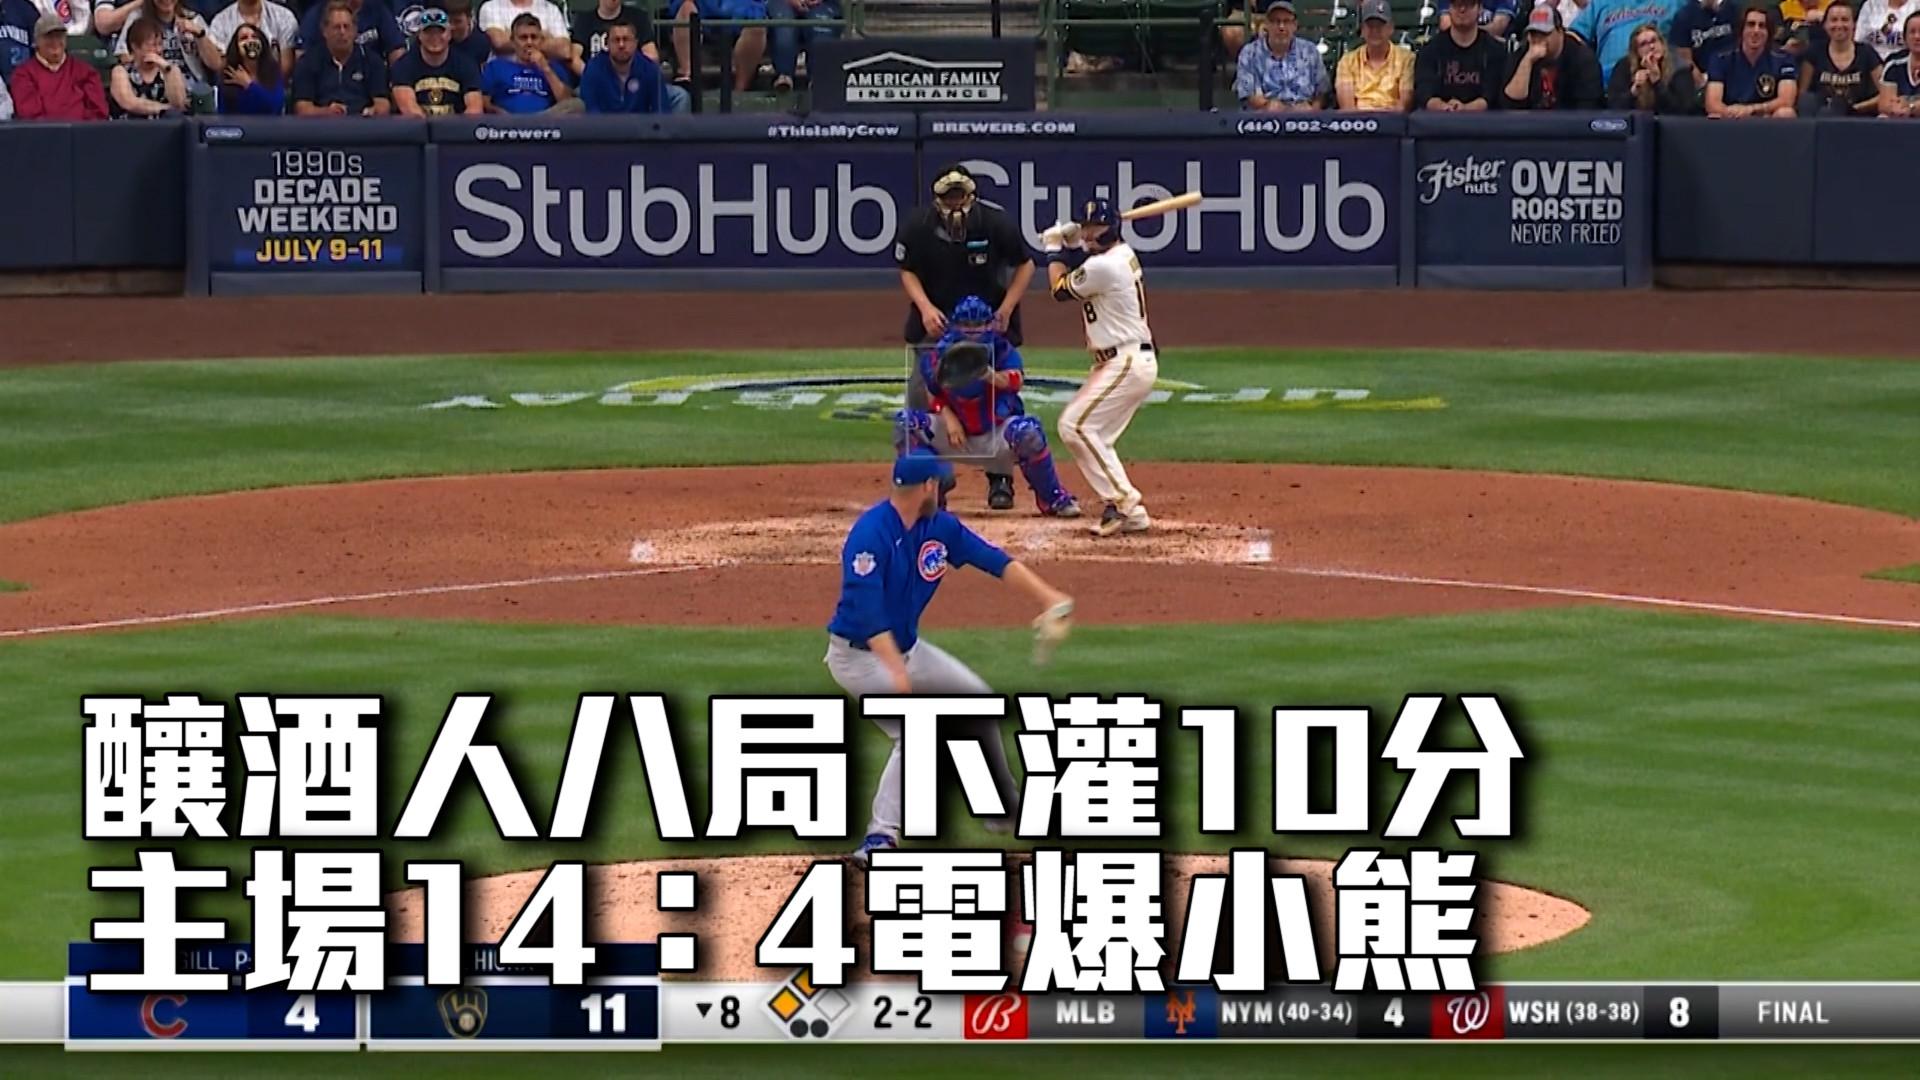 【MLB看愛爾達】釀酒人八局下灌10分 主場電爆小熊 06/29